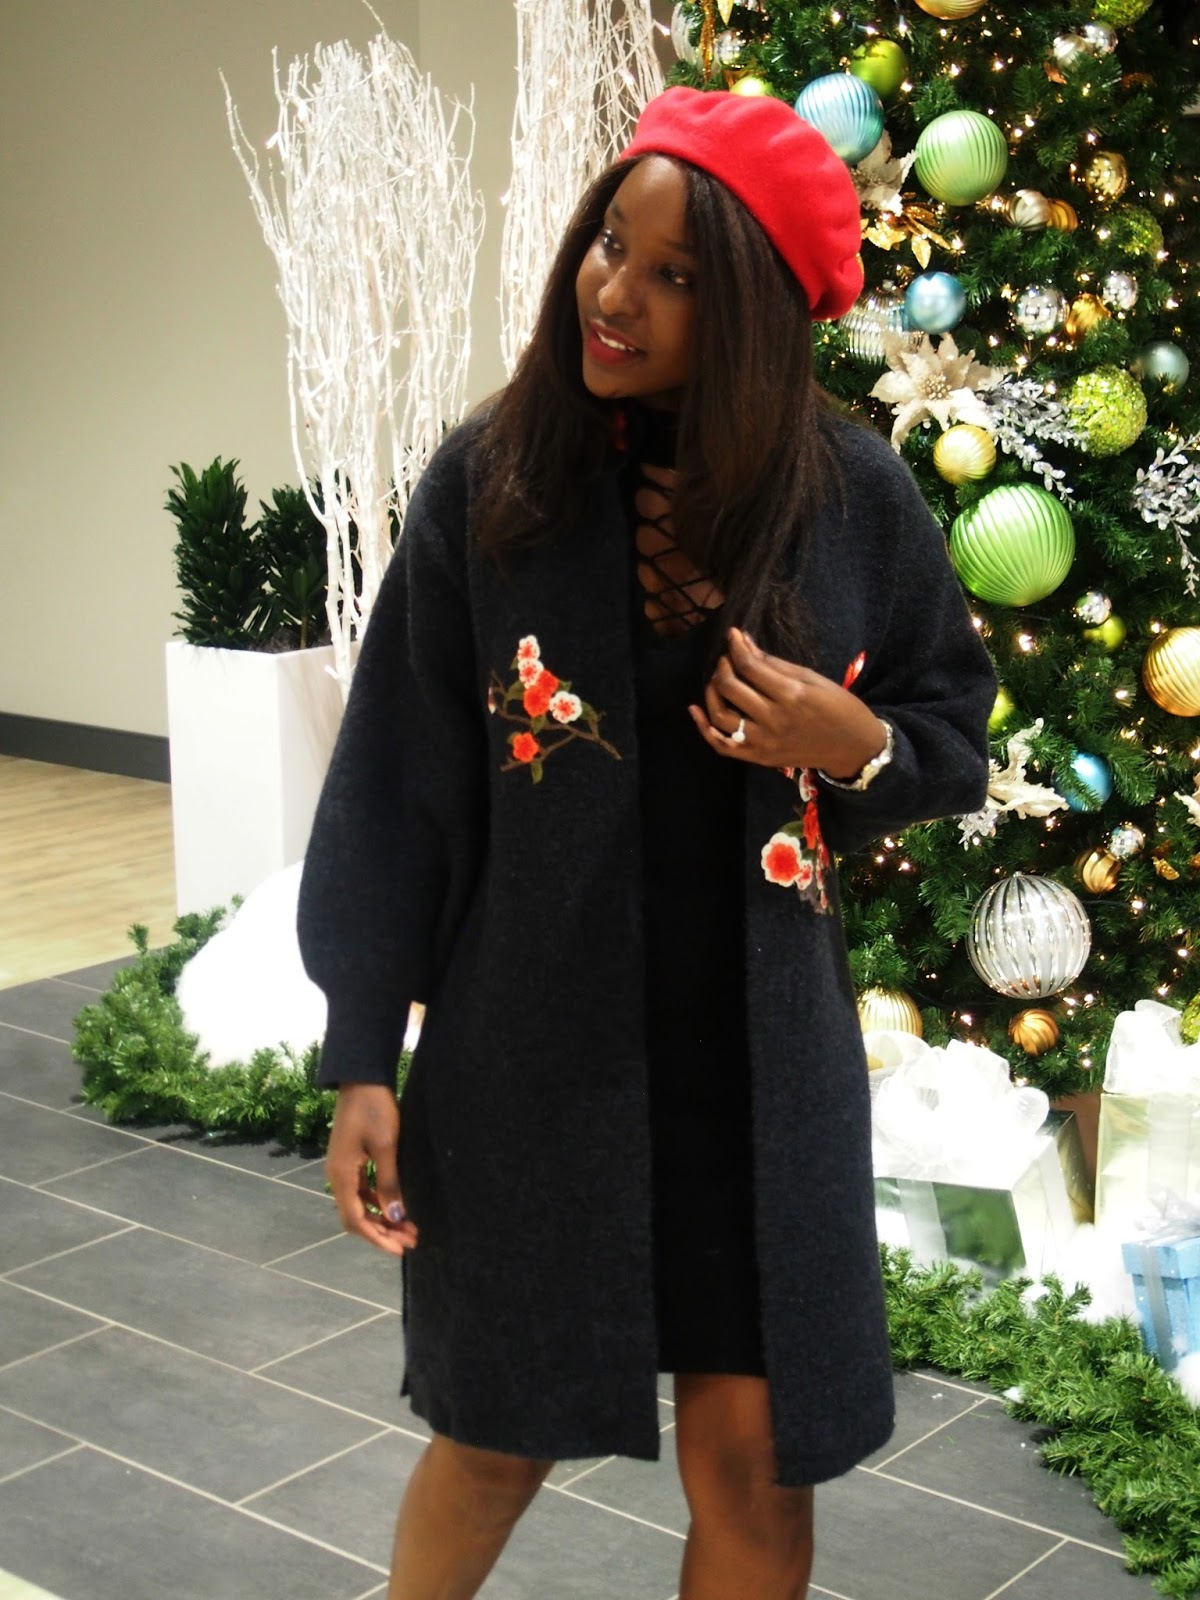 La X Sacha\'s Wardrobe: Merry Christmas!